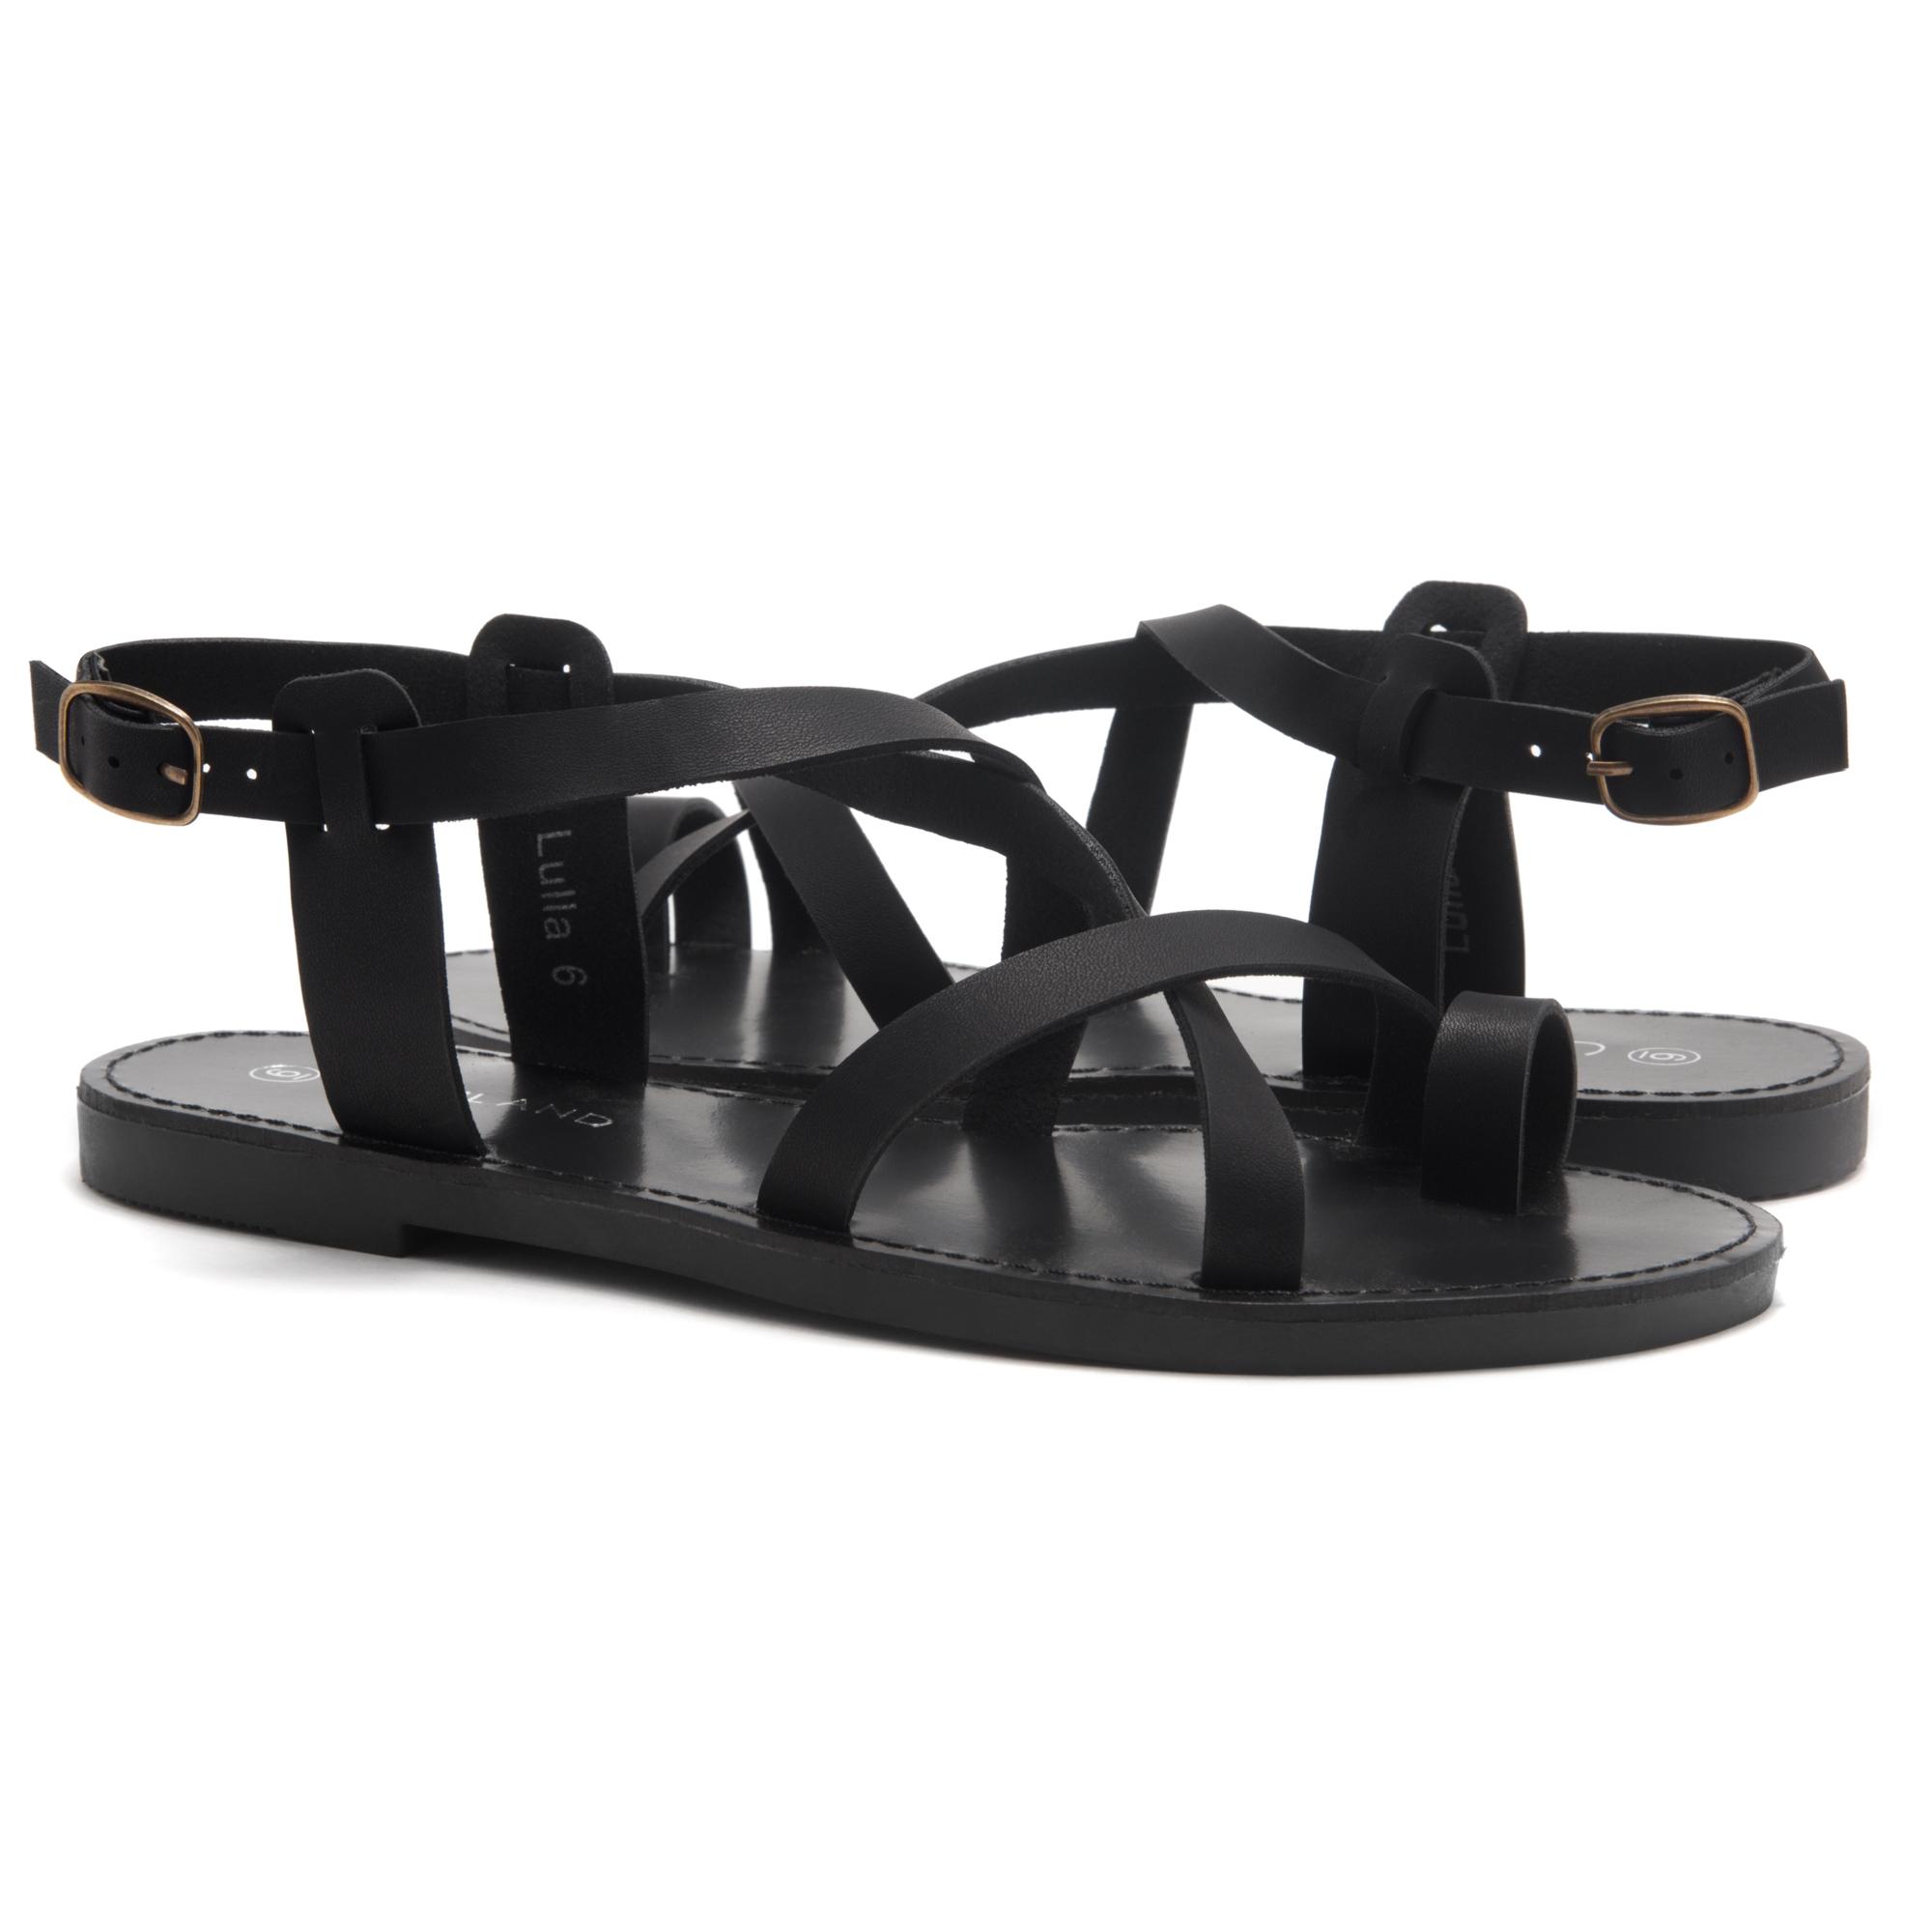 eb64c42ea84ba HerStyle Lulla-Toe Ring Sandal with Unique Crisscross Straps (Black)